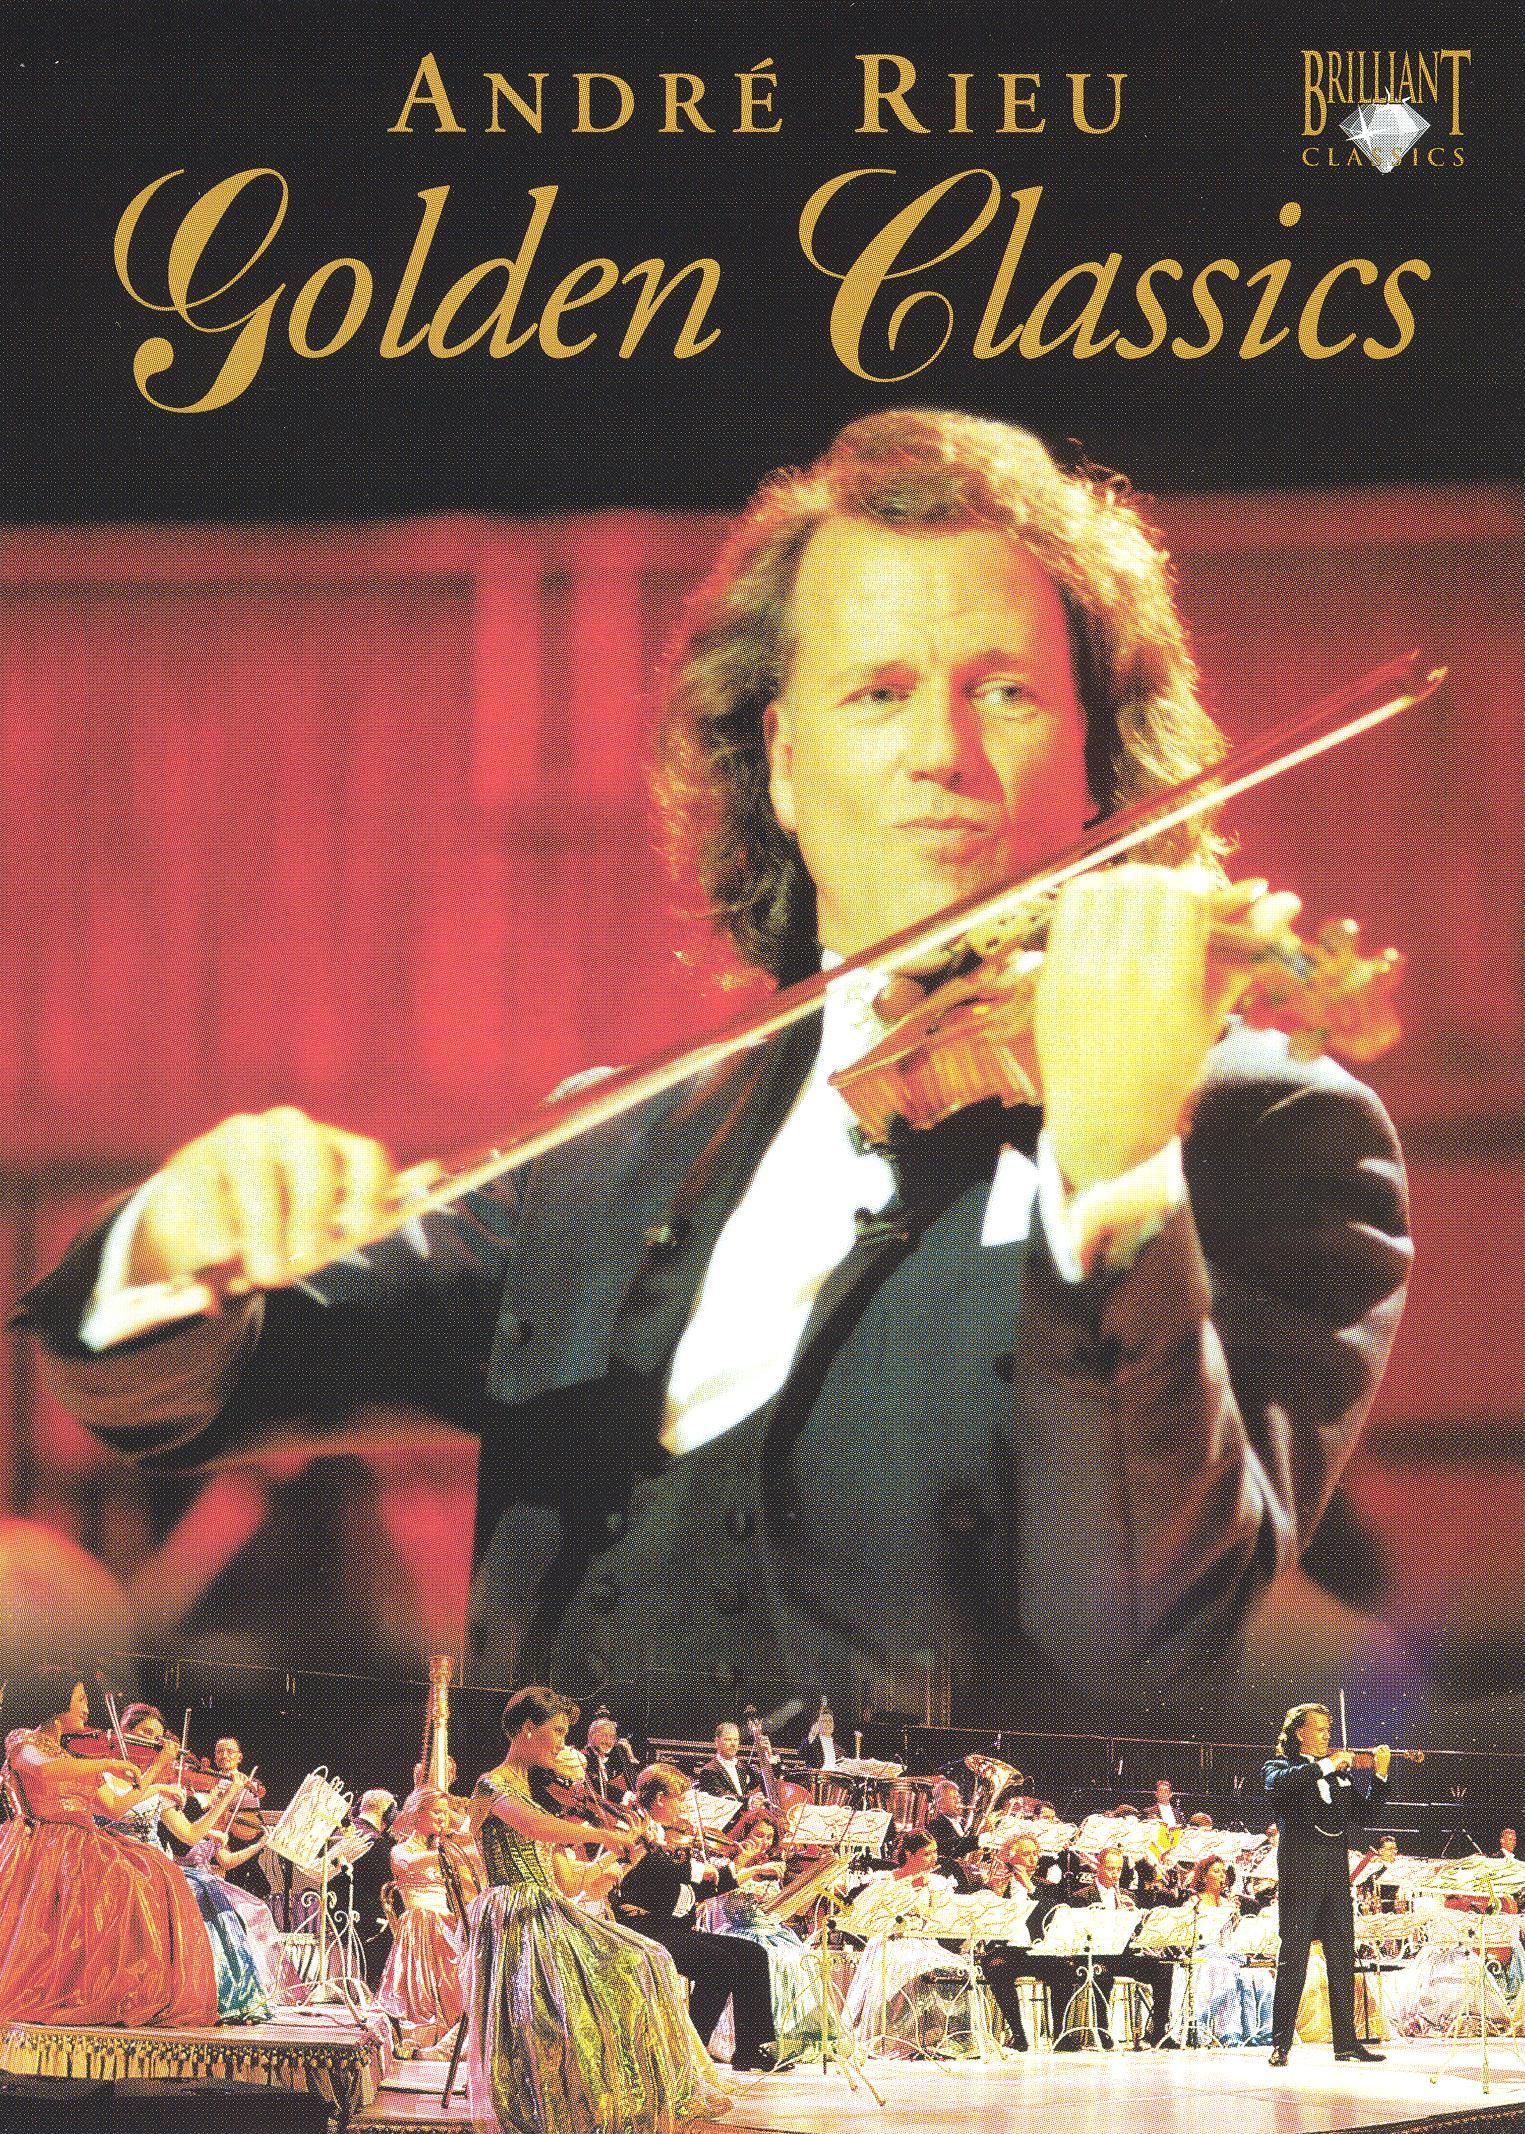 André Rieu: Golden Classics - Live From the Royal Albert Hall